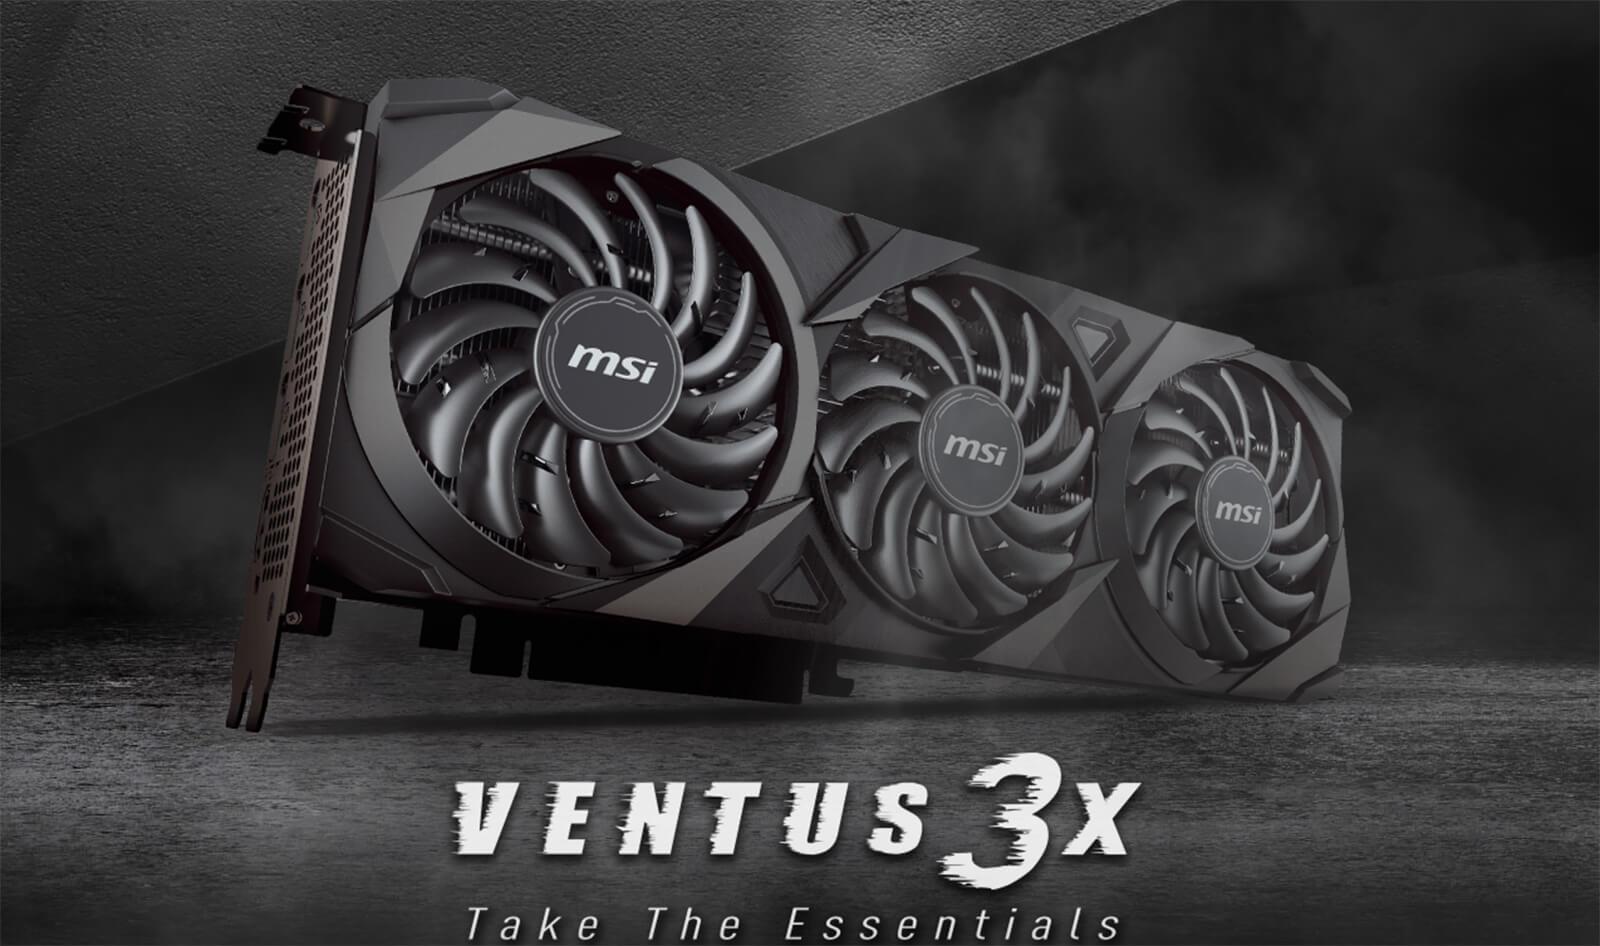 Msi Geforce Rtx™ 3060 Ventus 3x 12g Oc Features